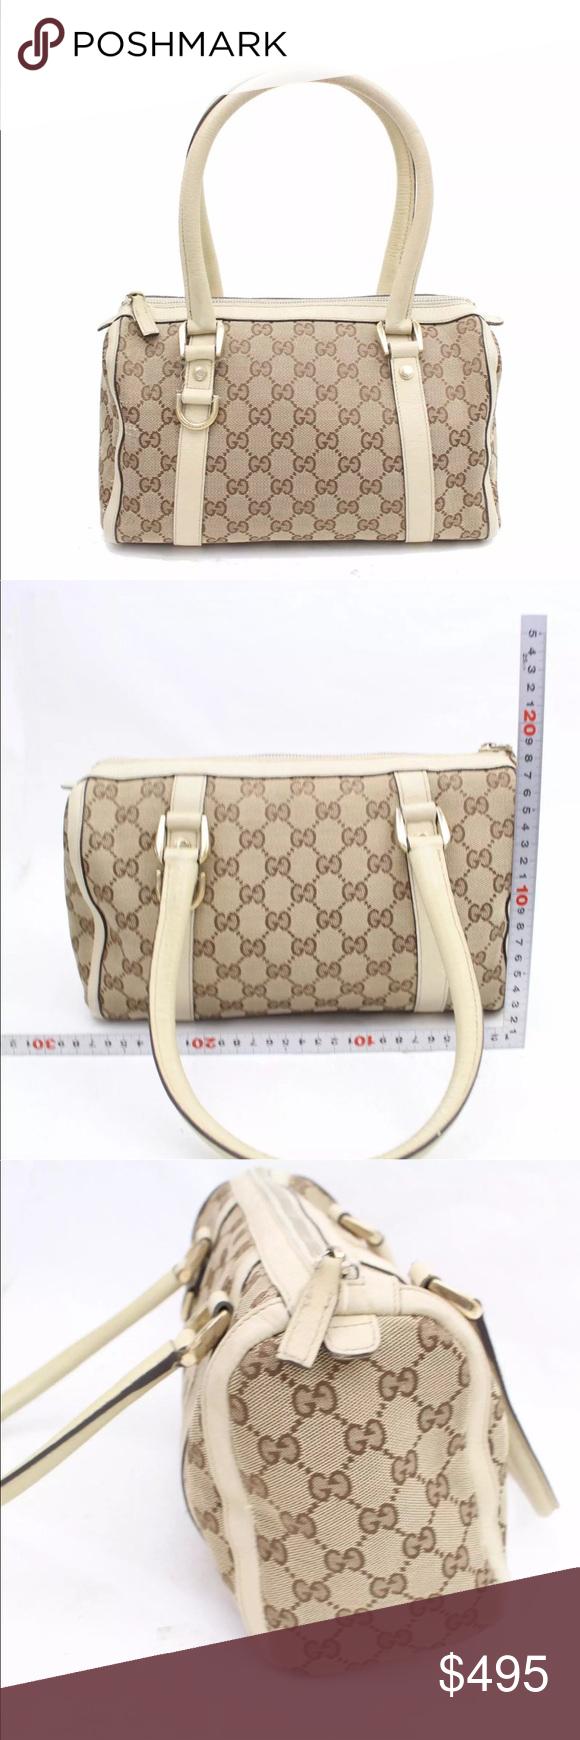 Authentic Chloe Leather Hand Bag Purse. Color: Black